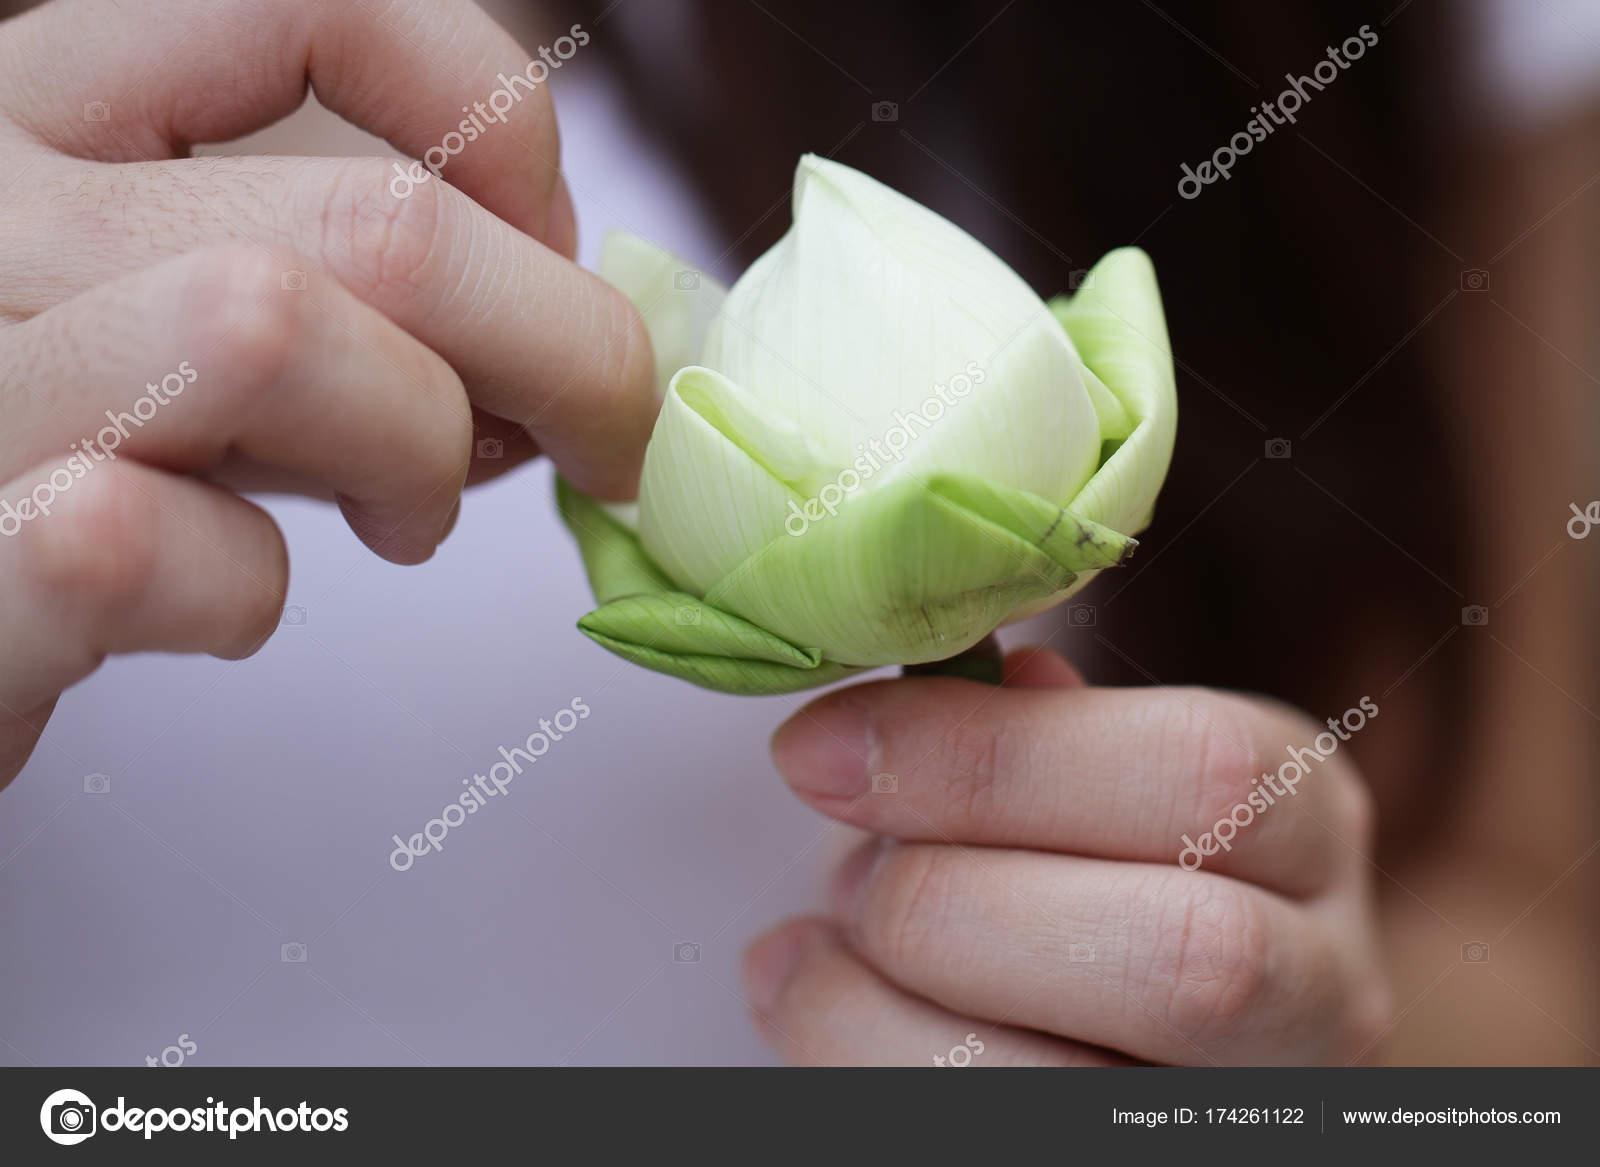 Lady Hands Folding Beautiful Green Organic Lotus Leaf Instruction